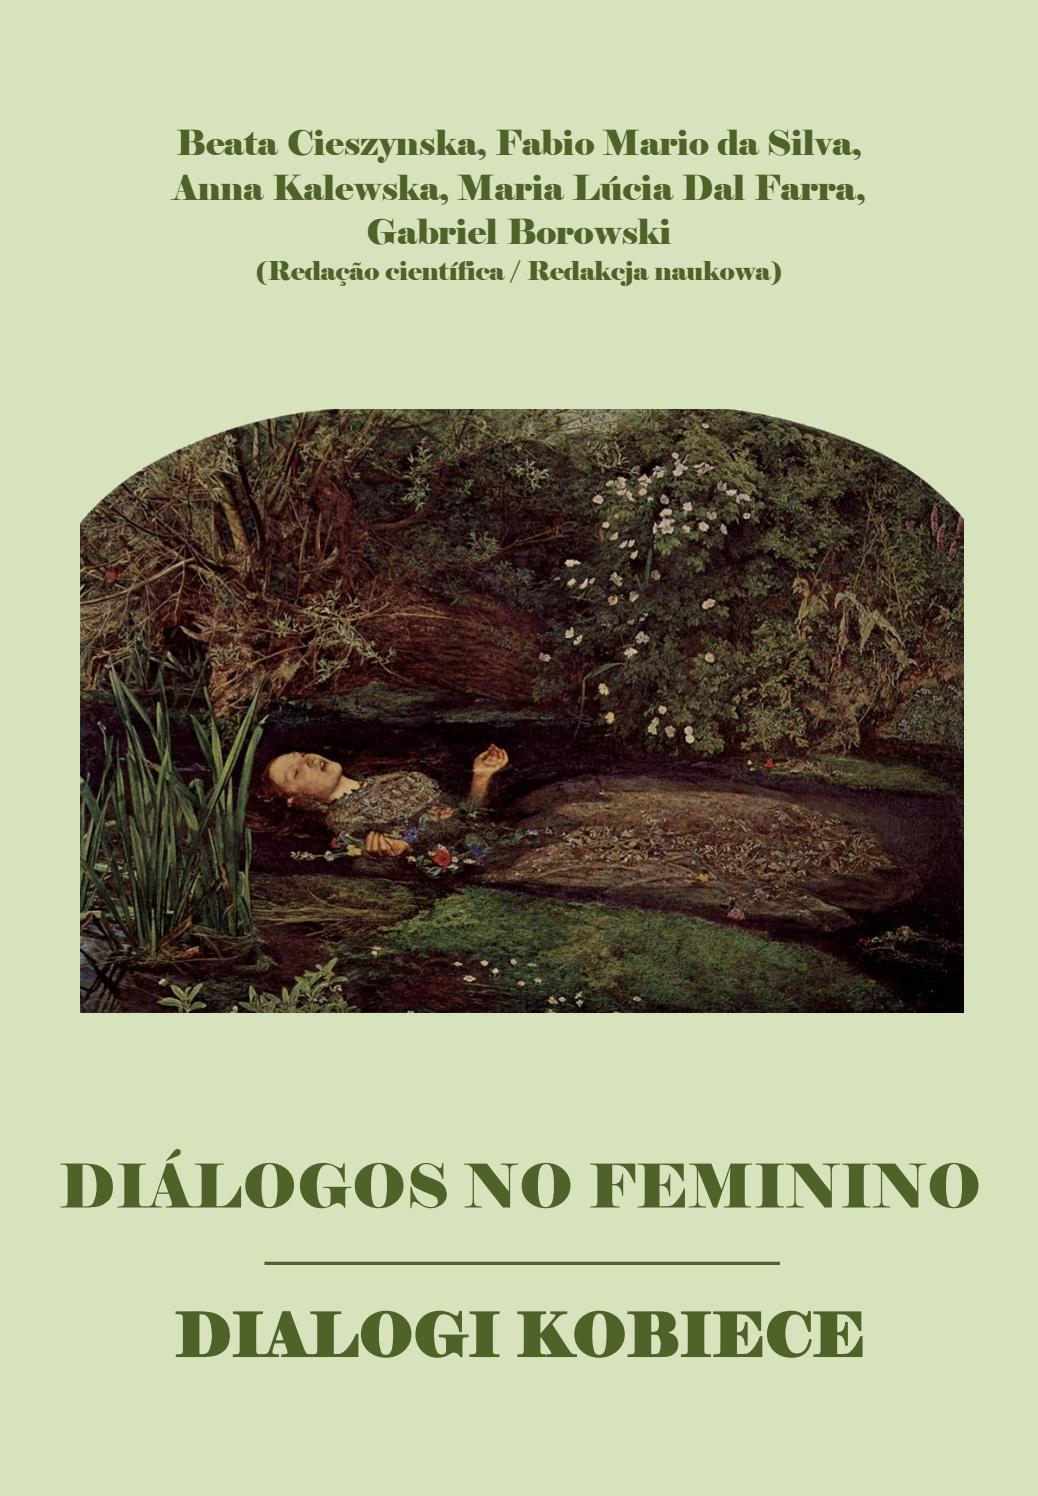 Diálogos No Feminino Antologia Poética Maria Pawlikowska